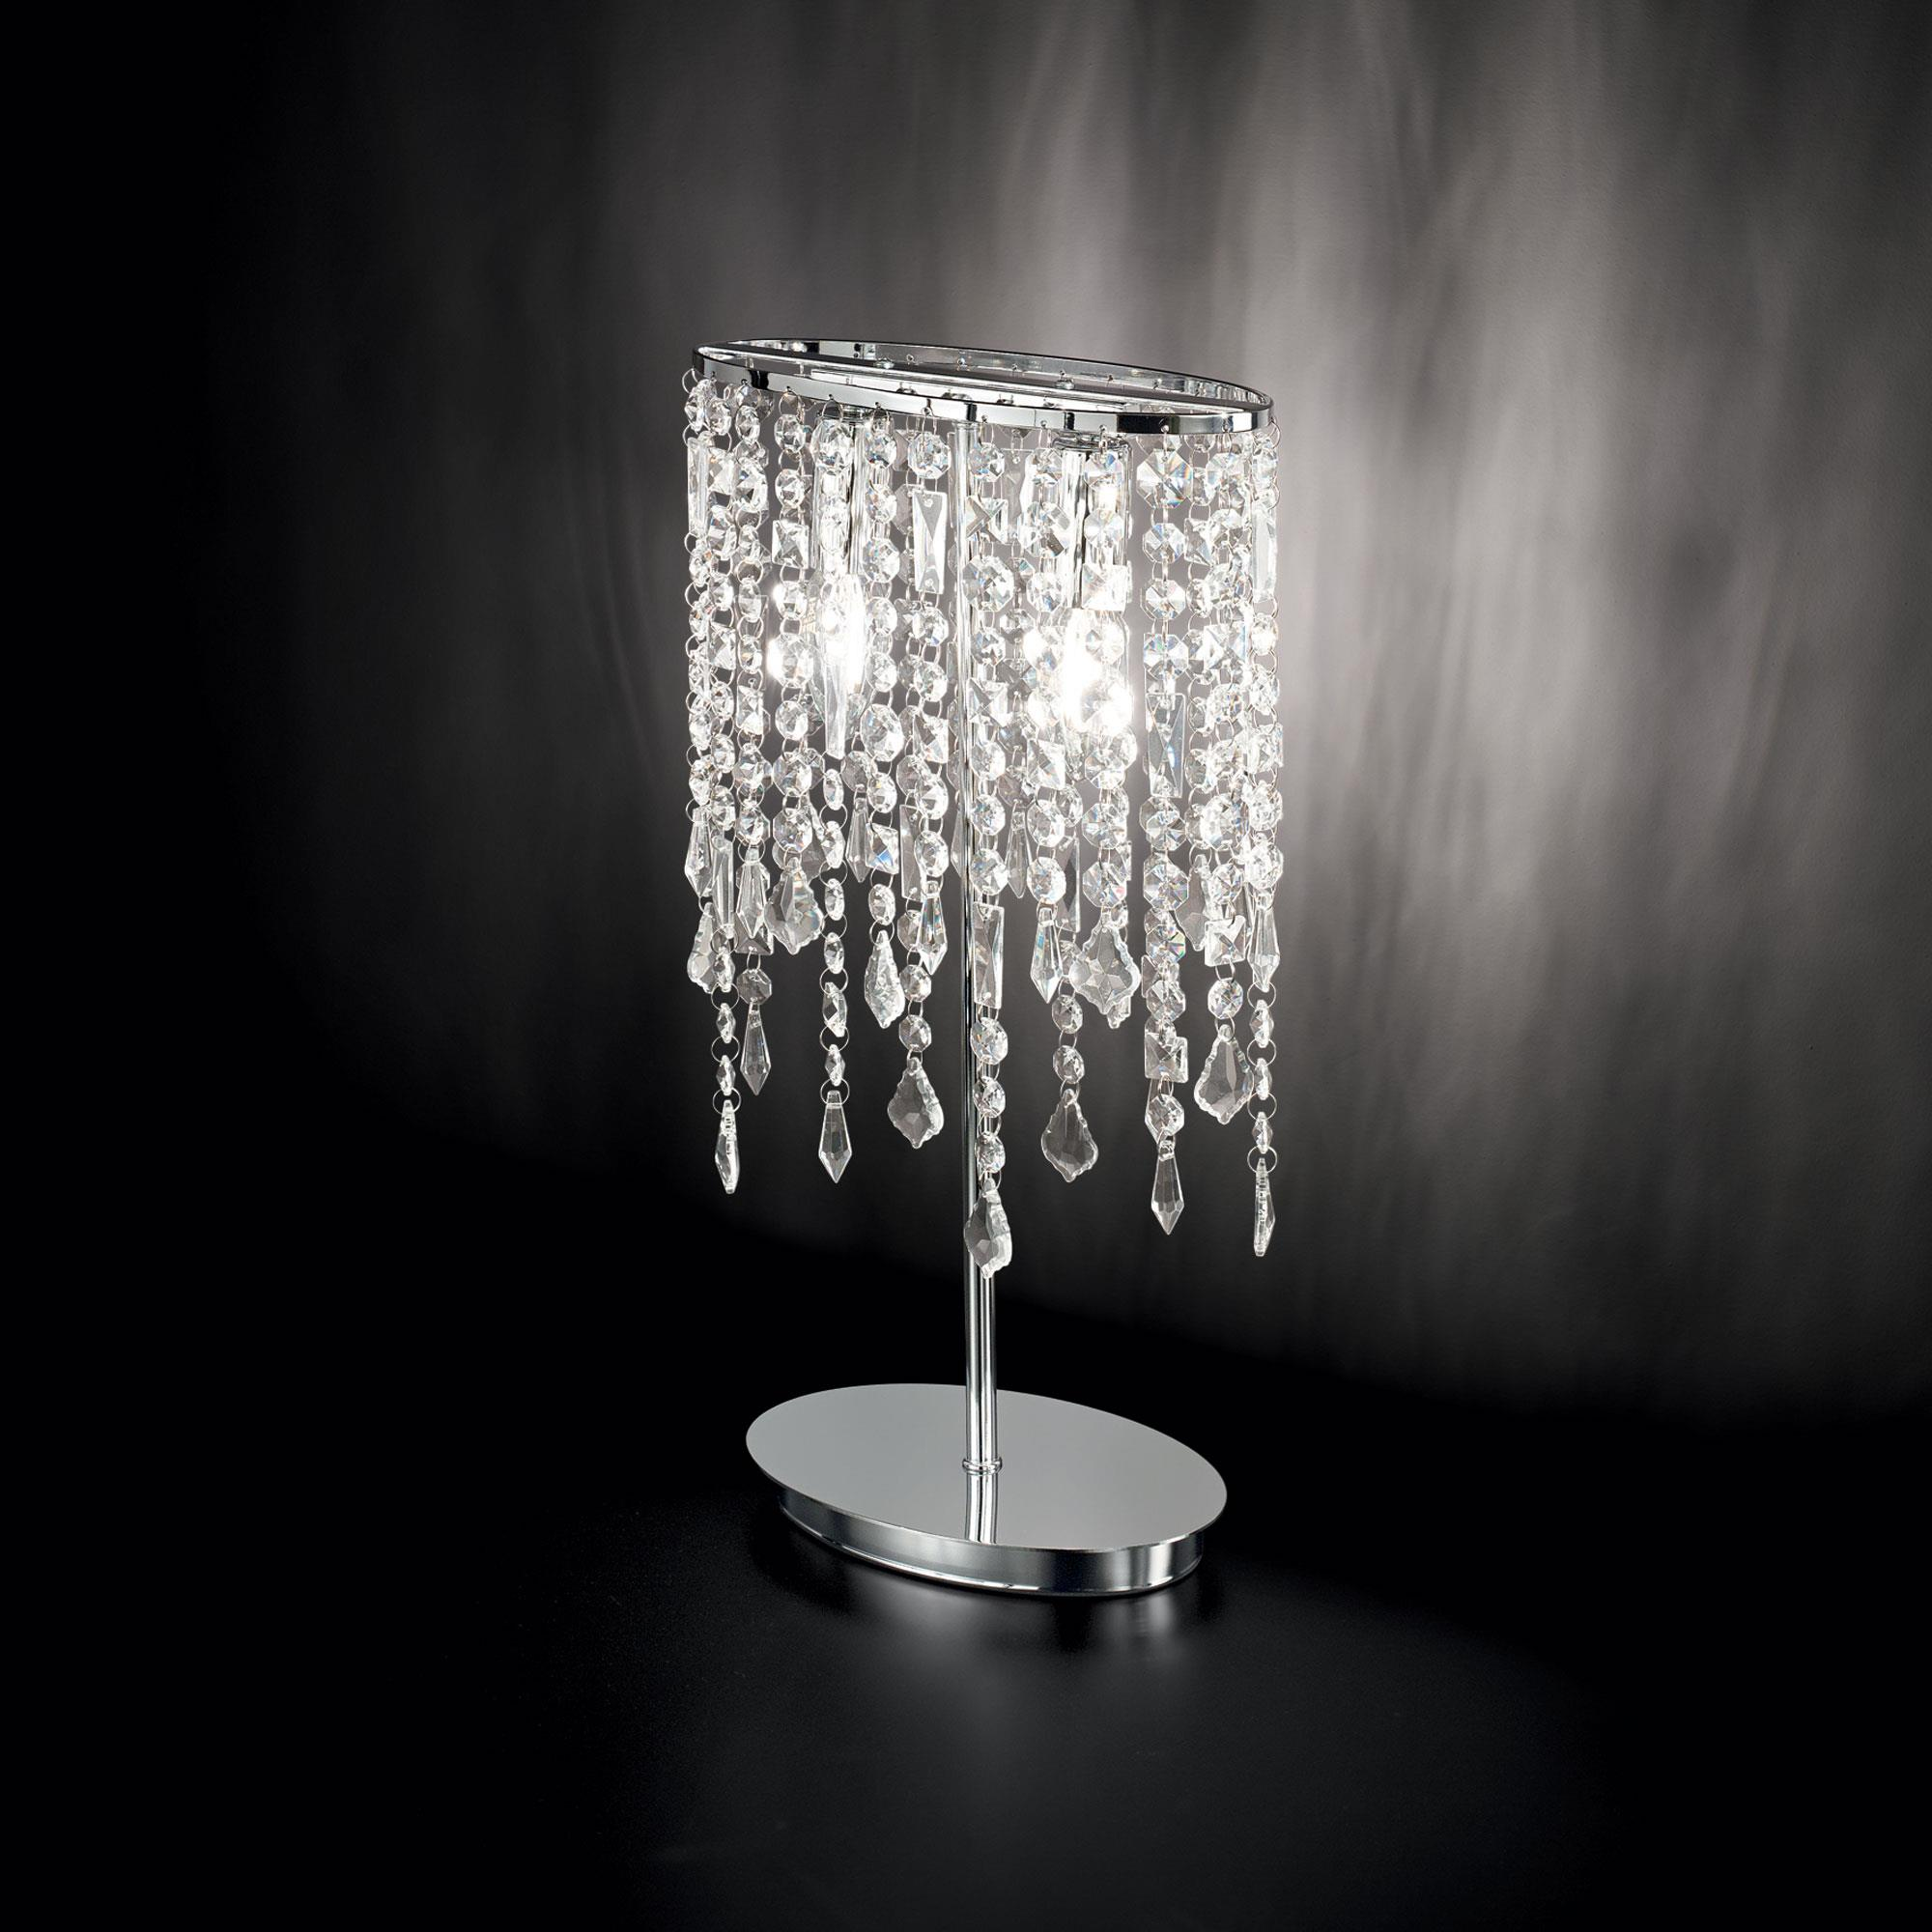 Ideal Lux 008356 Rain TL2 Clear asztali kristály lámpa